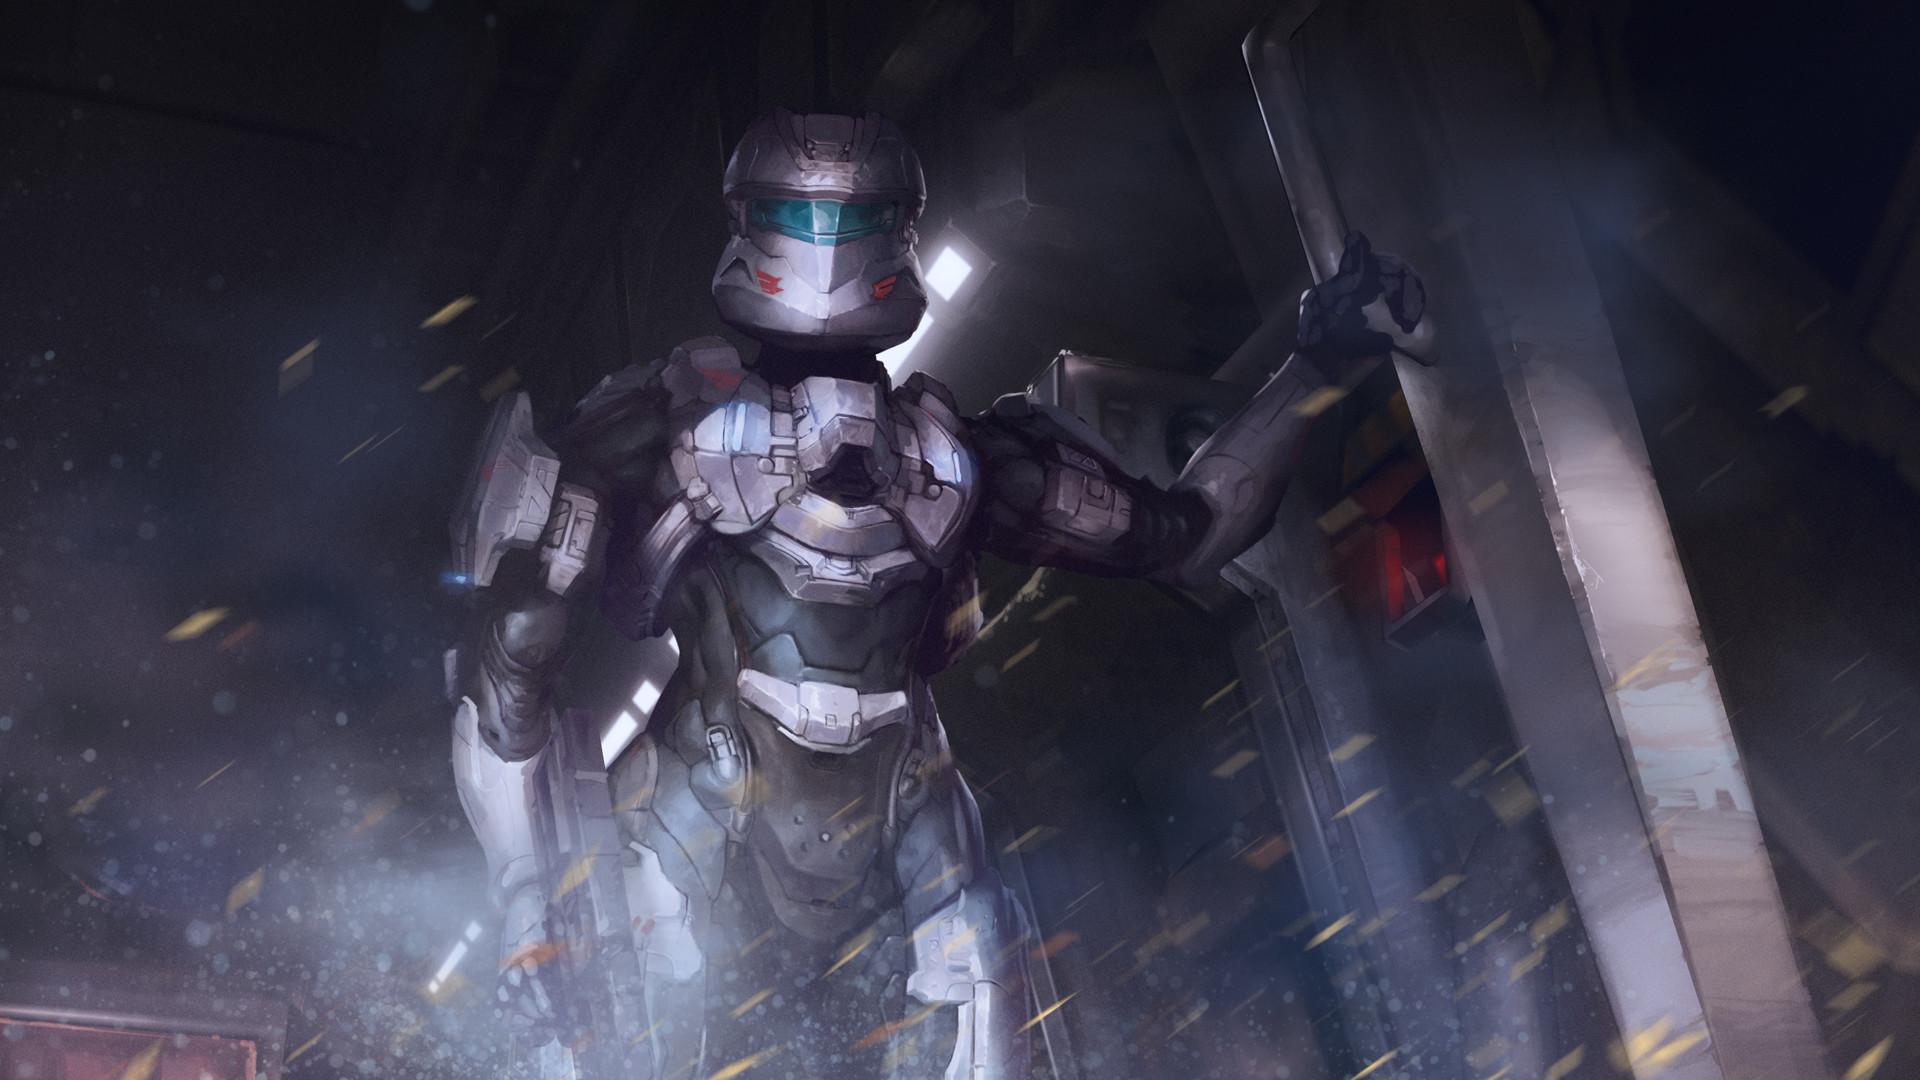 Res: 1920x1080, Wallpaper #5 Wallpaper from Halo: Spartan Assault